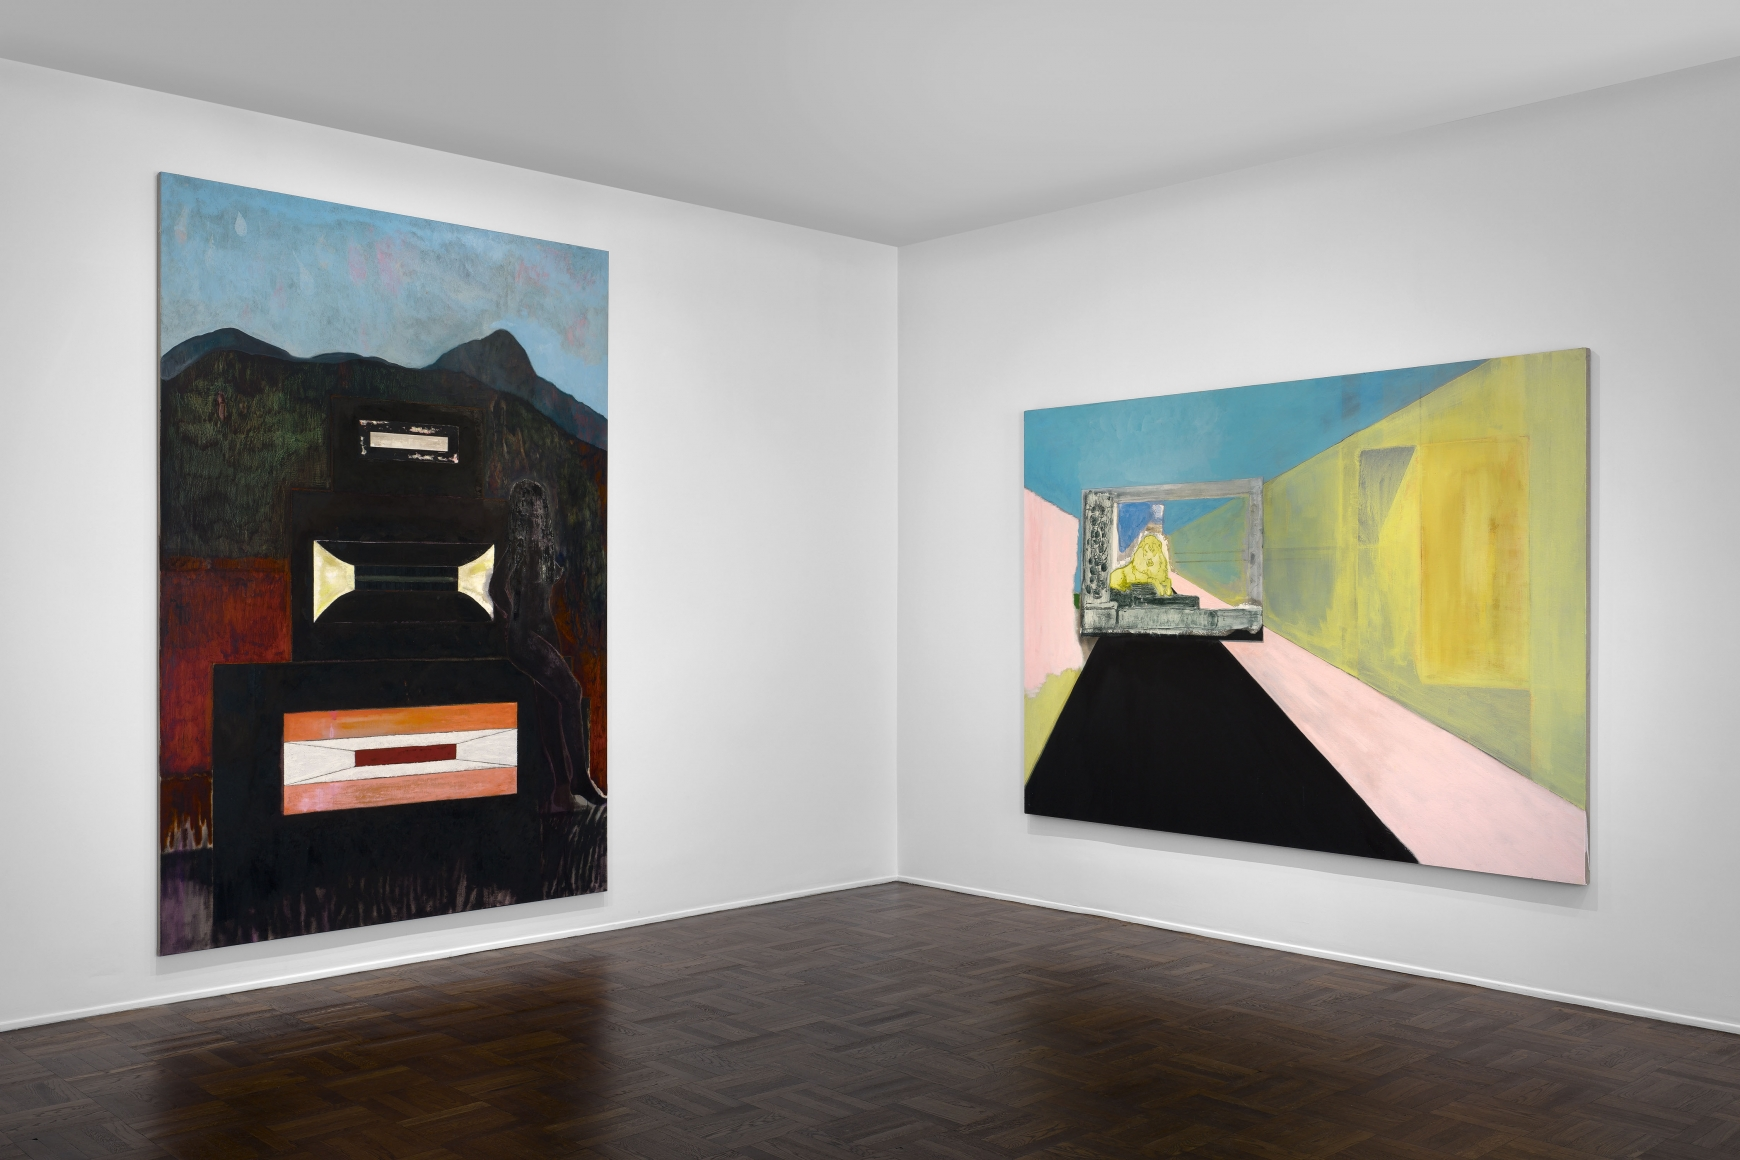 Peter Doig, New York, 2015, Installation Image 2